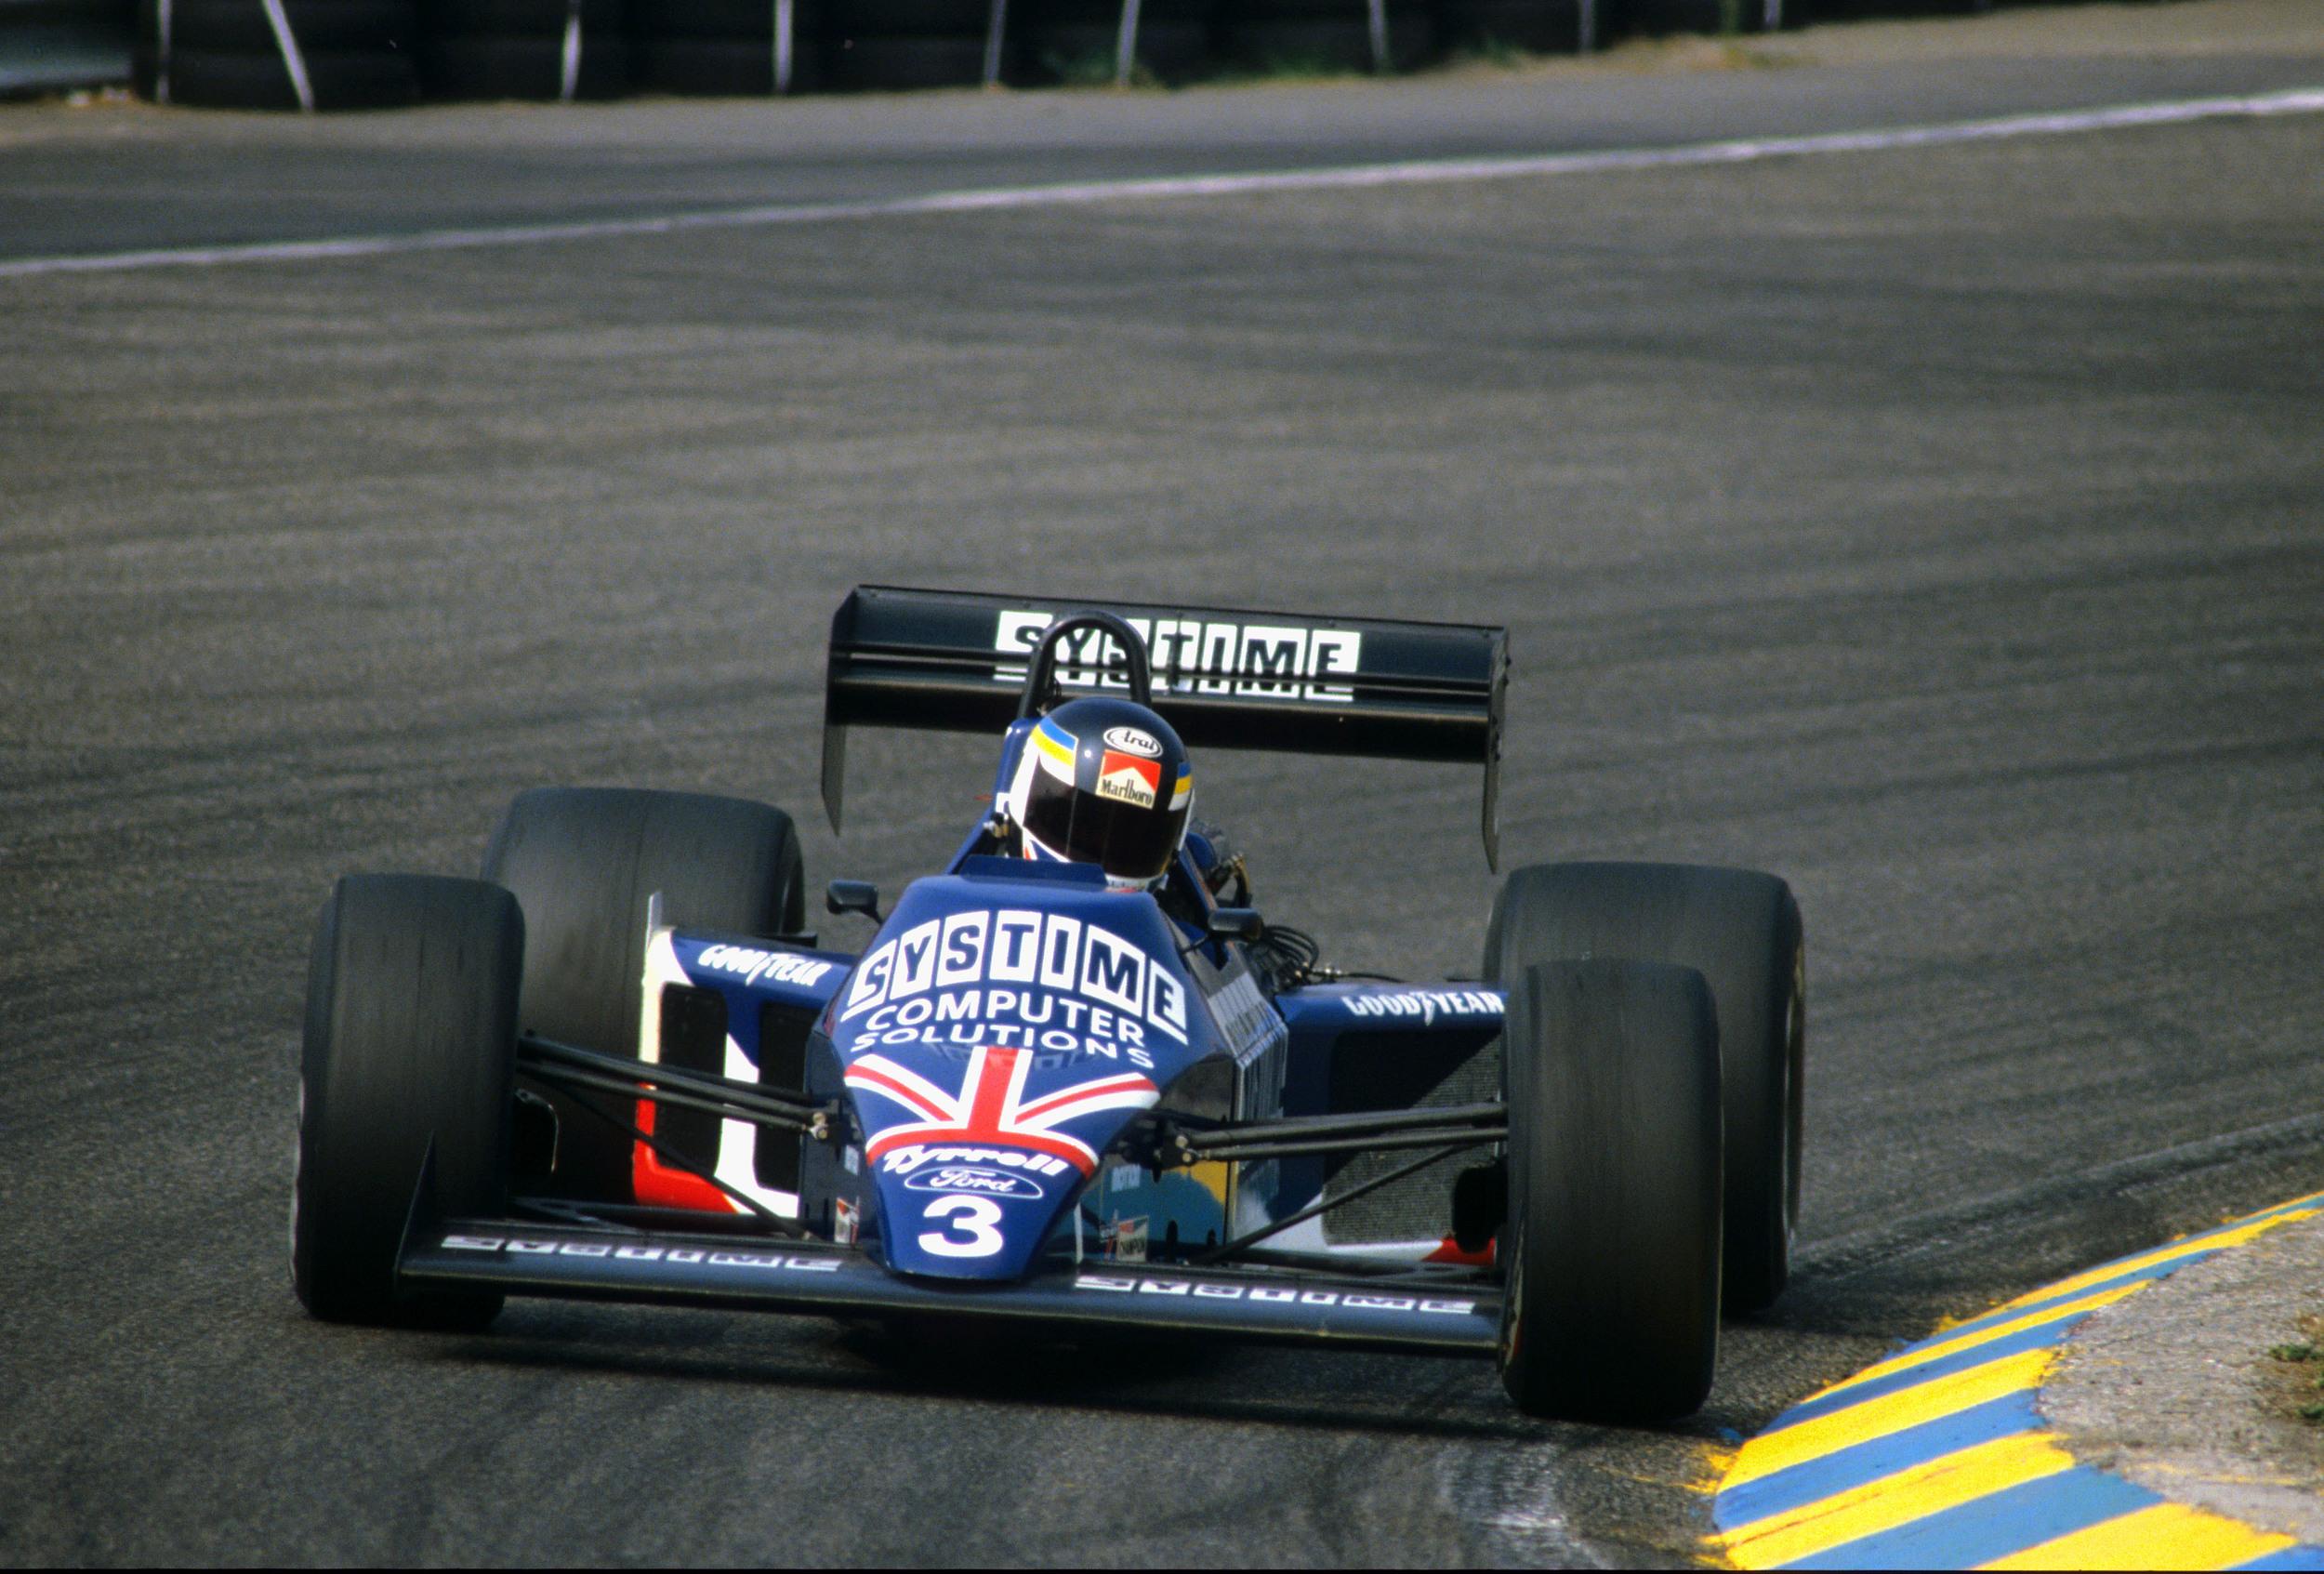 Stefan Johansson Tyrell F1 Zandvoort.jpg